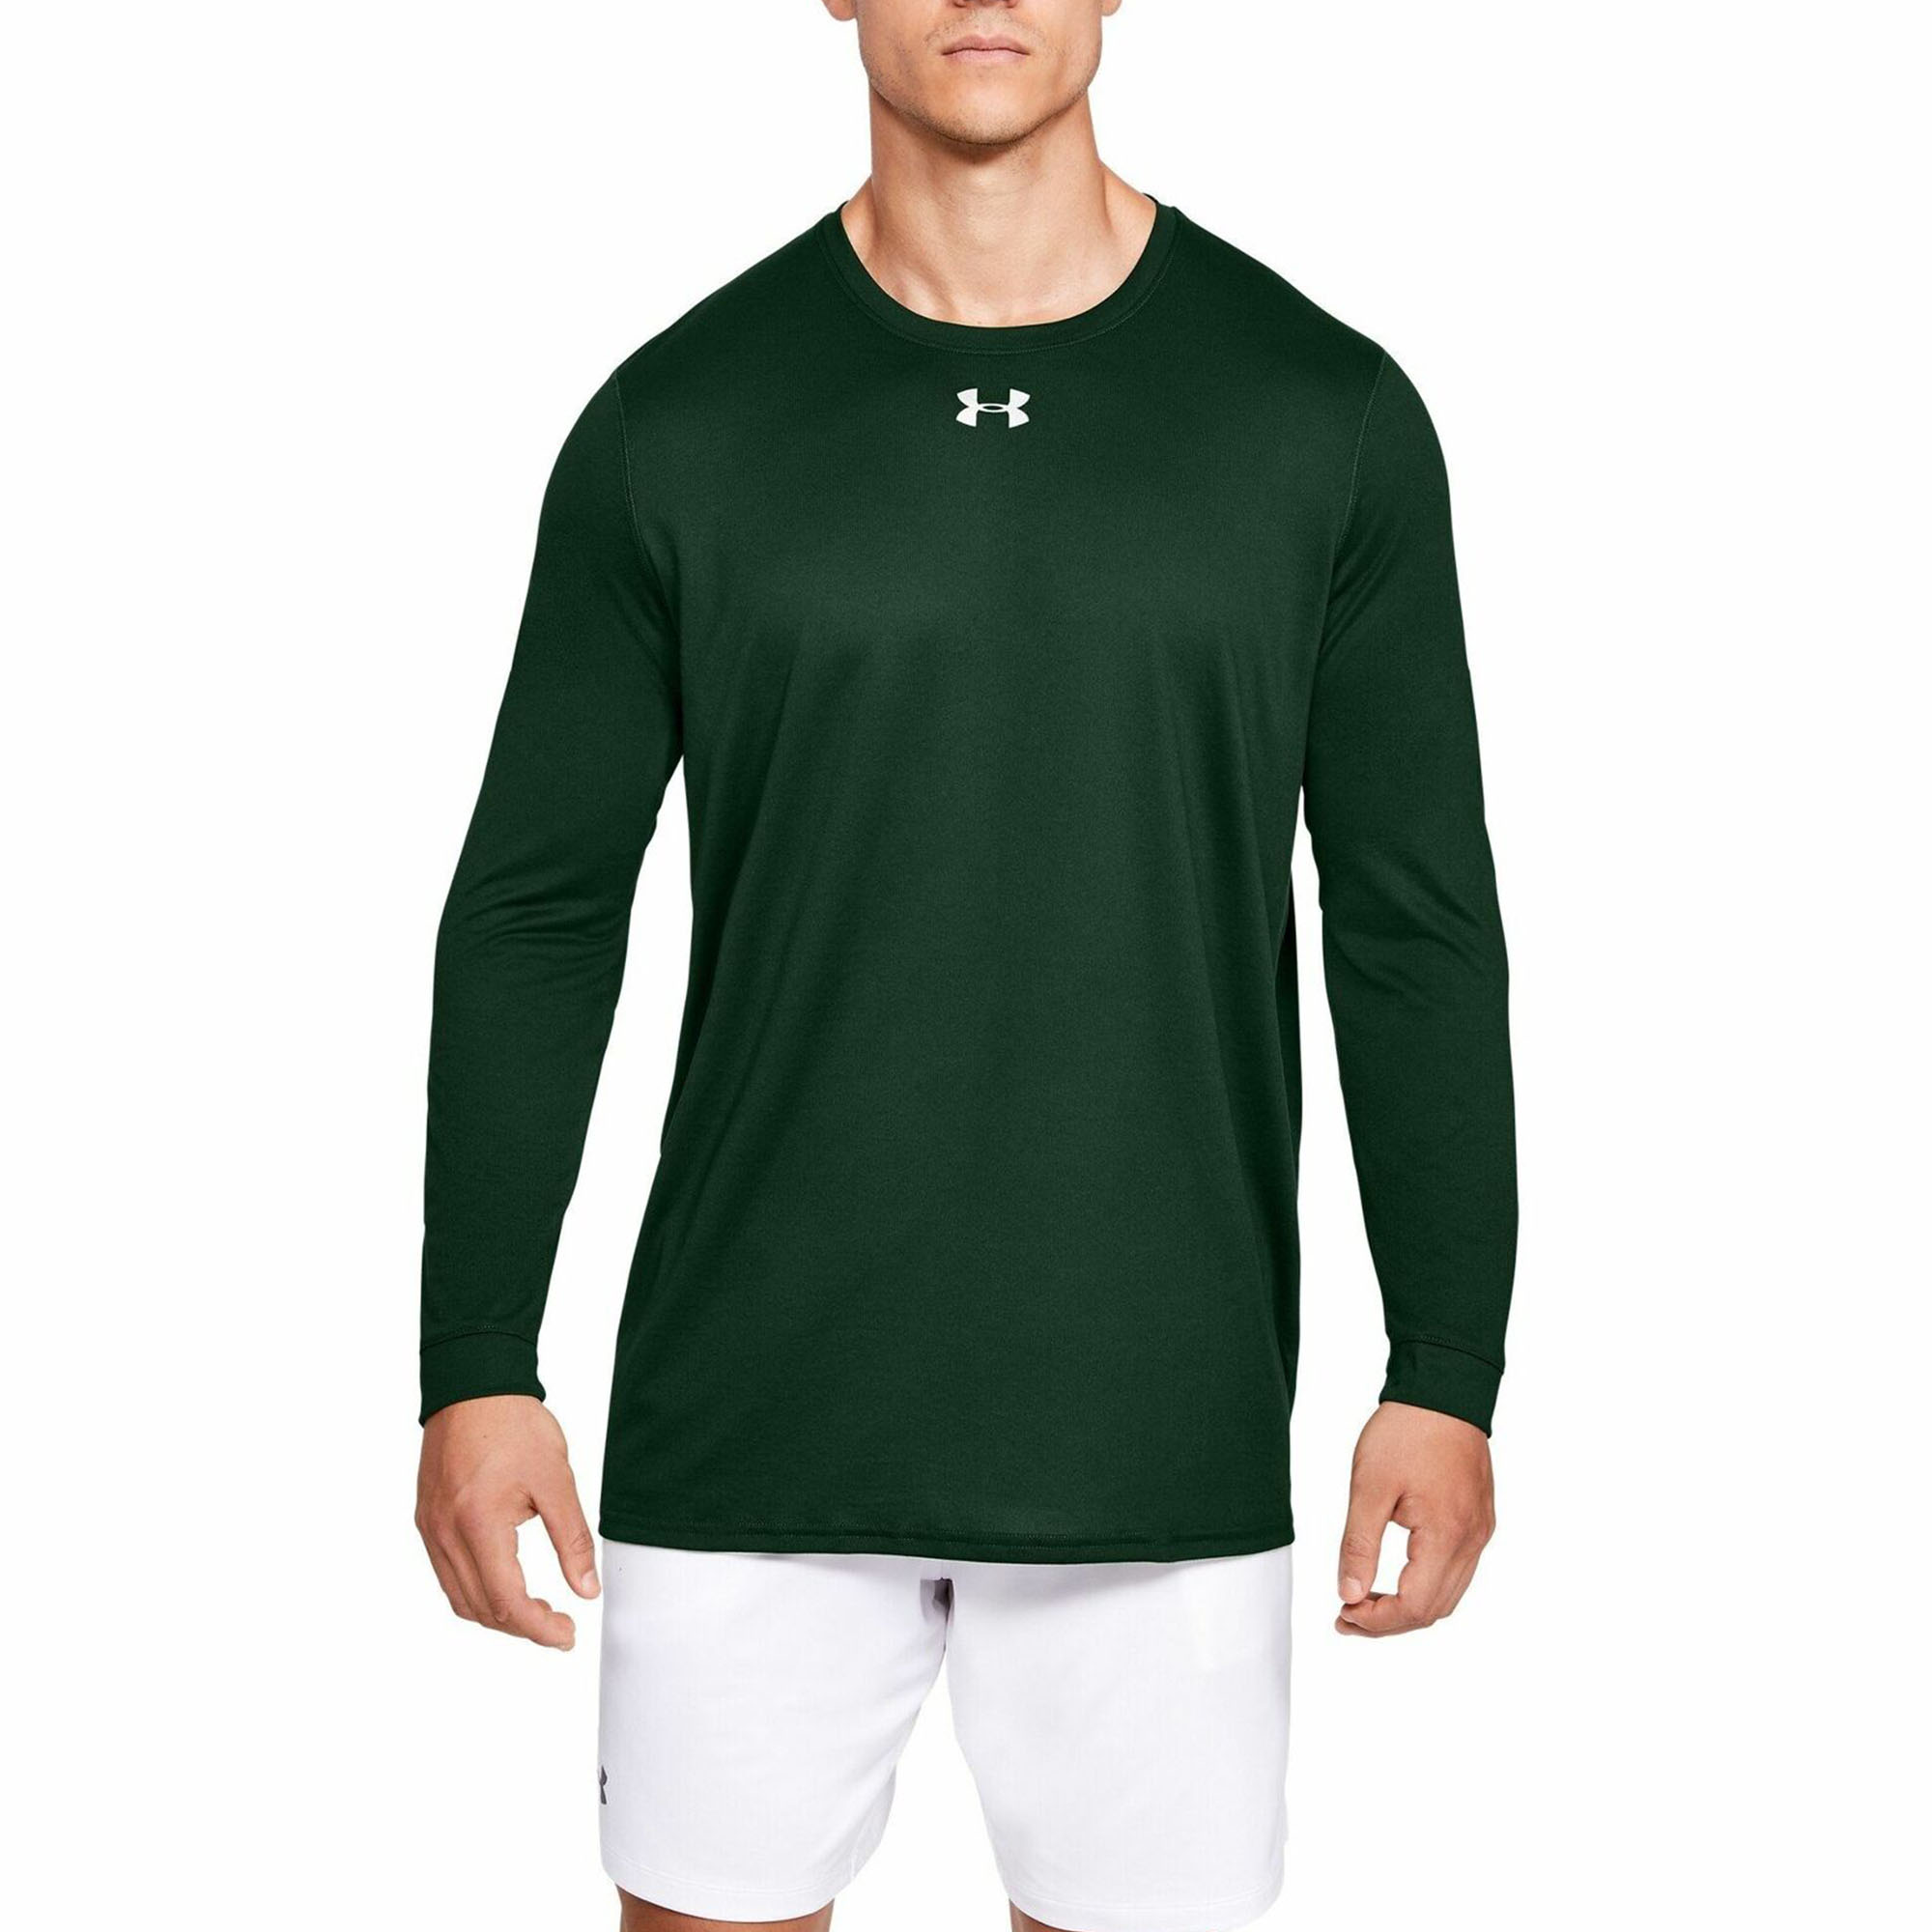 Small, Maroon-Metallic Silver Under Armour Mens UA Locker 2.0 Long Sleeve Shirt